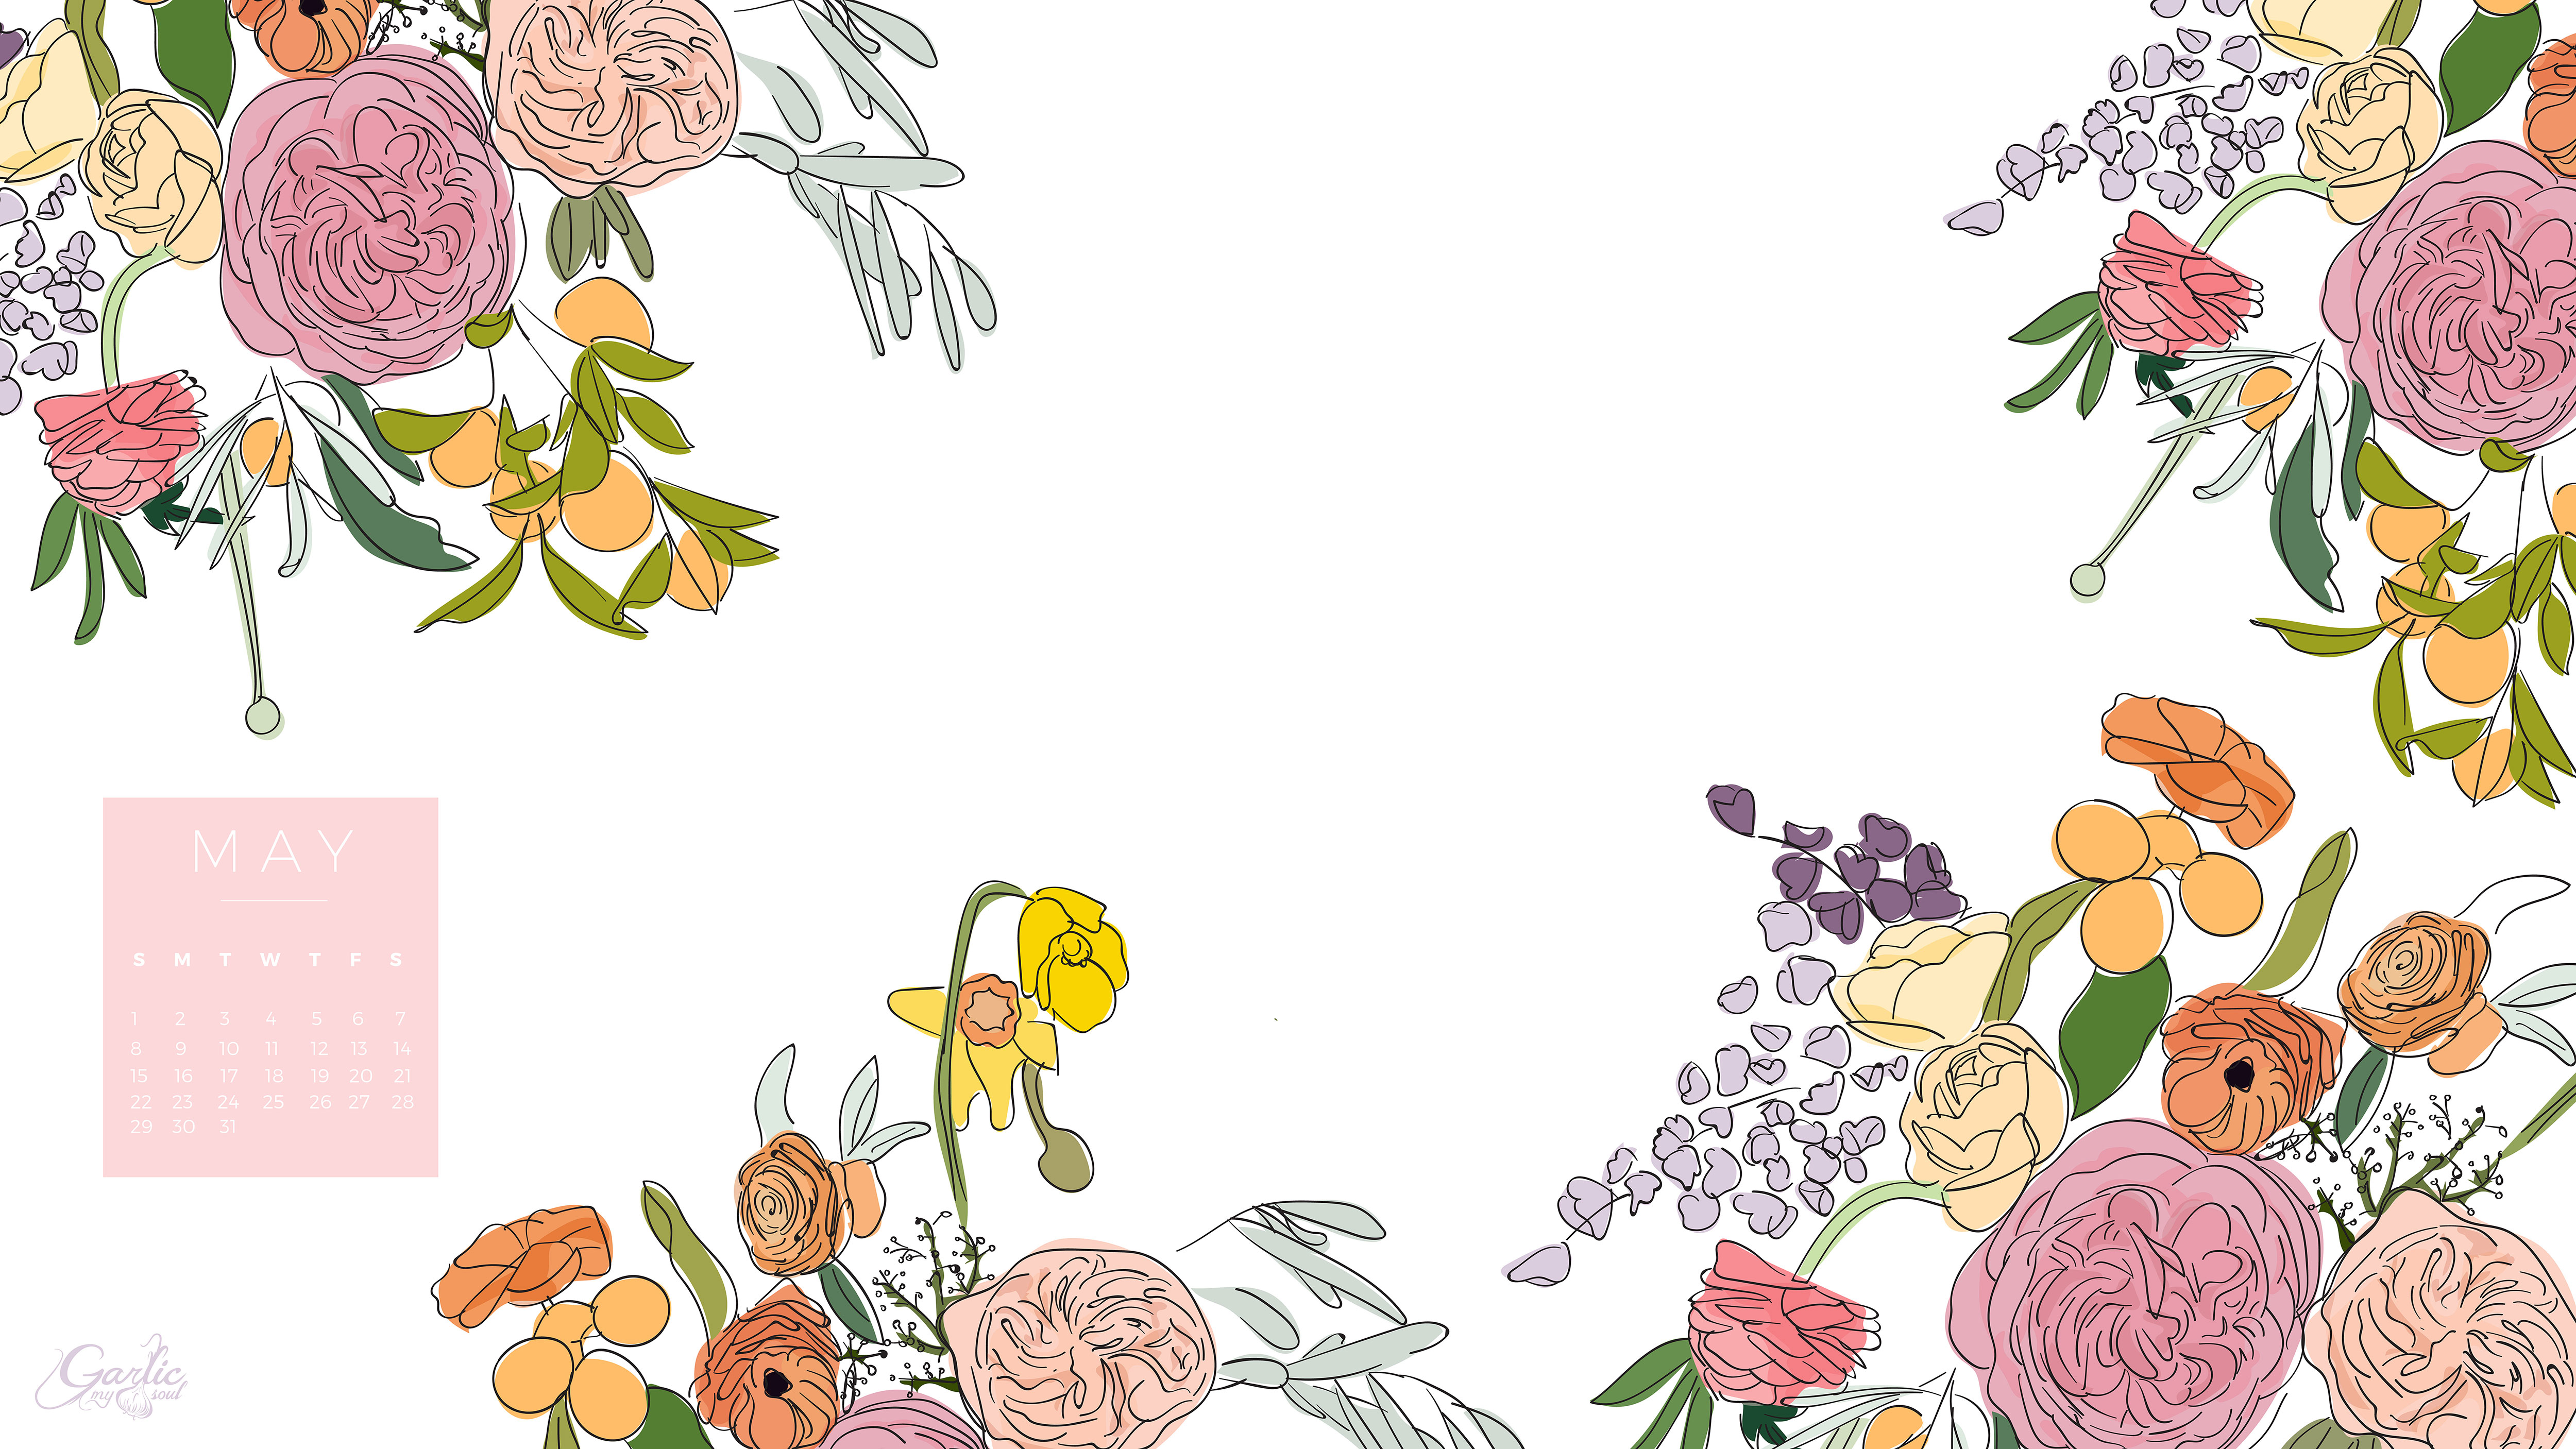 May Calendar Desktop : Garlic my soul may desktop calendar